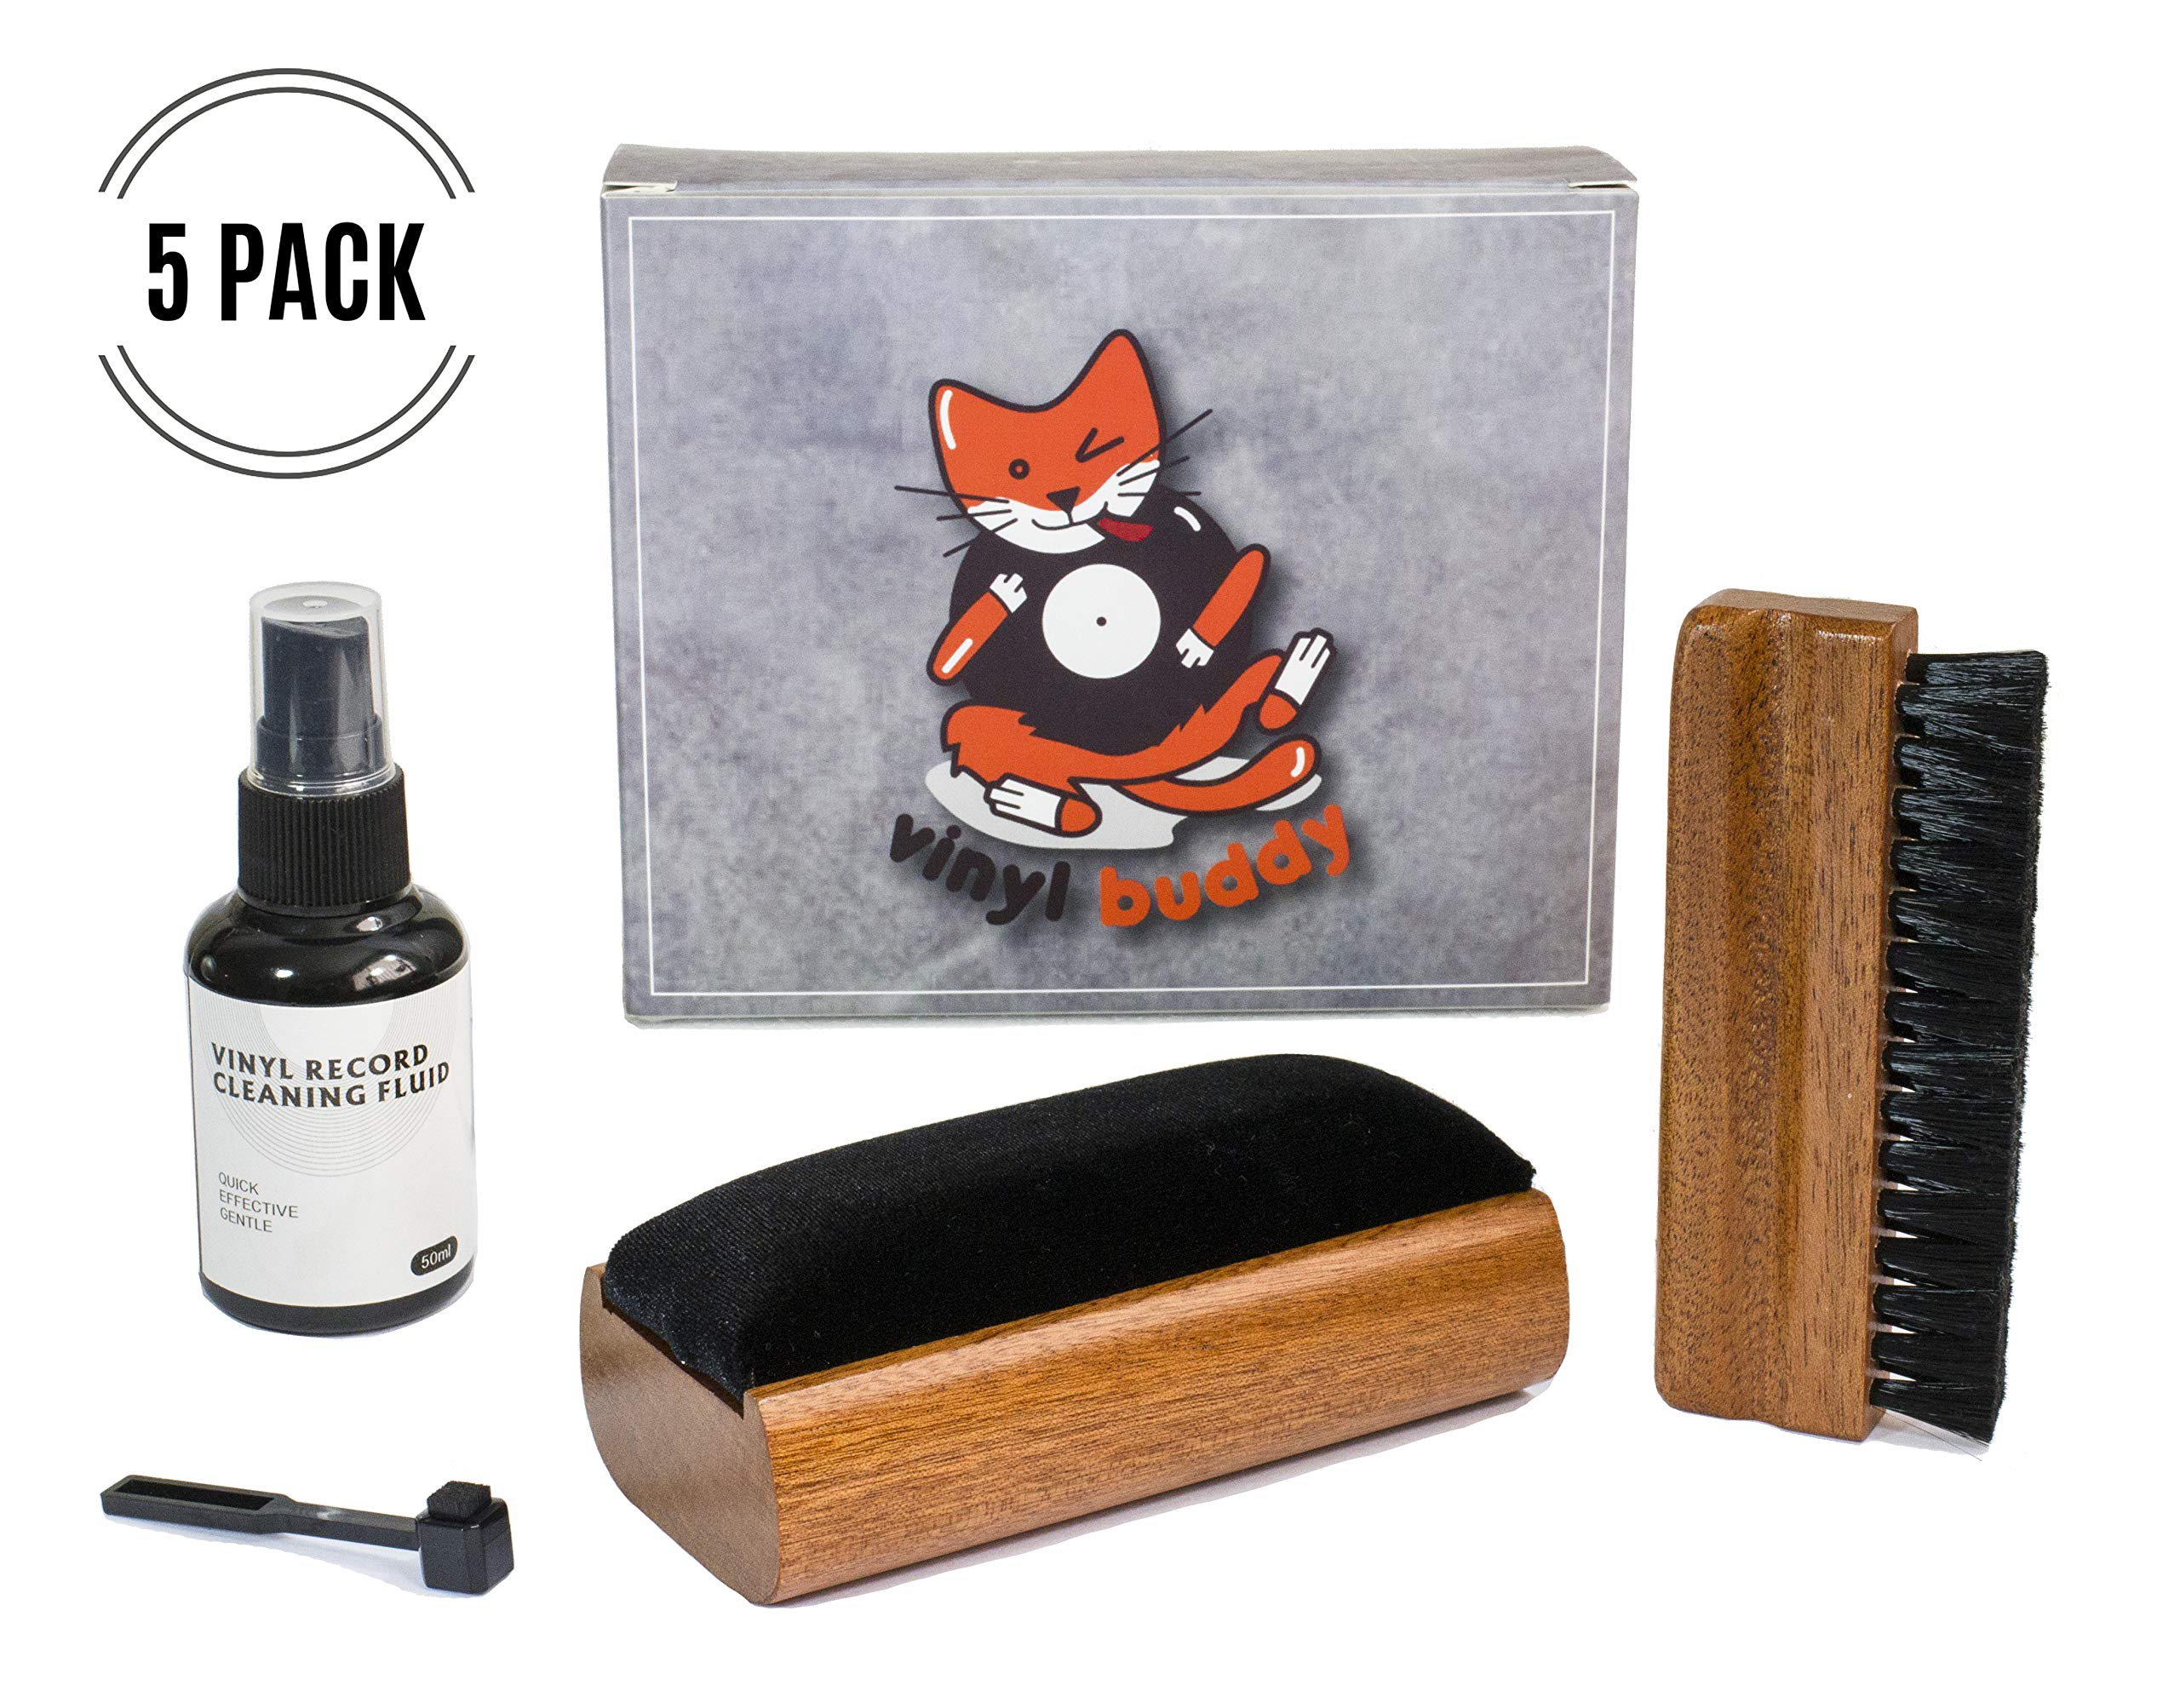 Vinyl Buddy - Premium 5 Piece Record Cleaner Kit Includes: Velvet Brush - Microfiber Brush - Stylus Brush - LUX Cleaning Liquid & Storage Pouch - Rejuvenate and Revive Your Vinyl by Vinyl Buddy